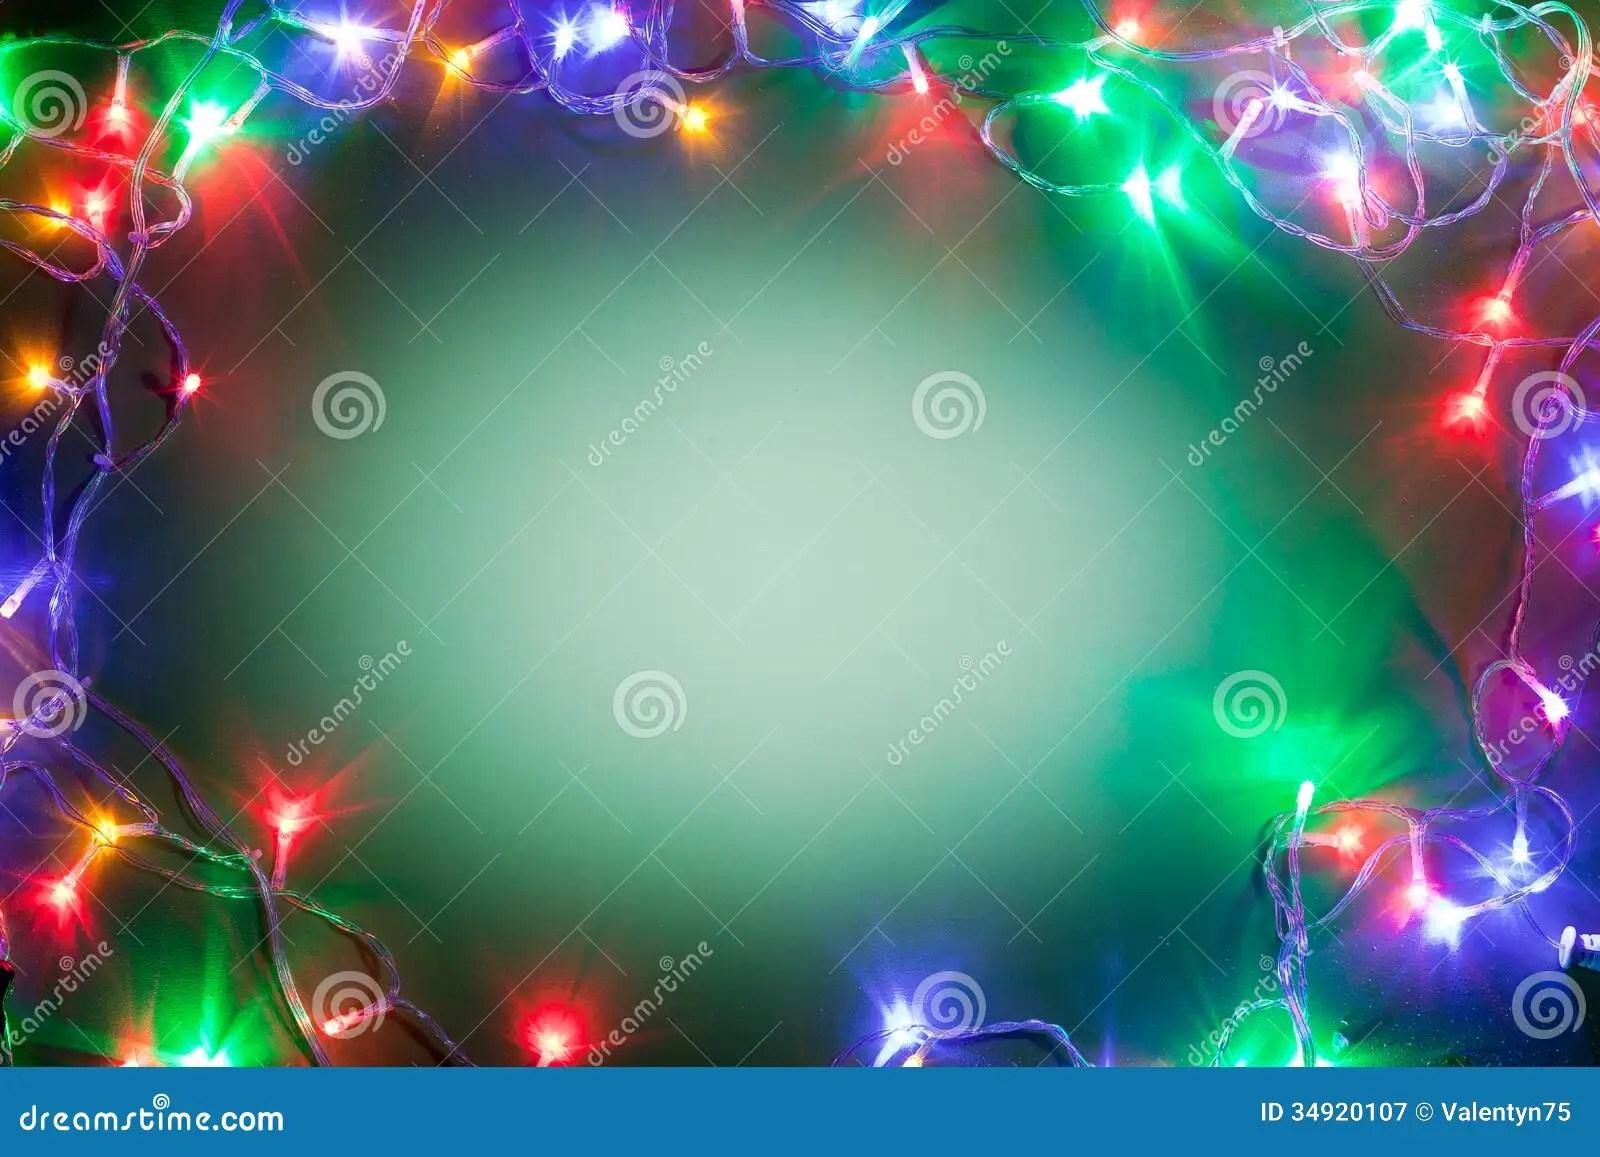 Christmas Frame With Fairy Lights Stock Image Image